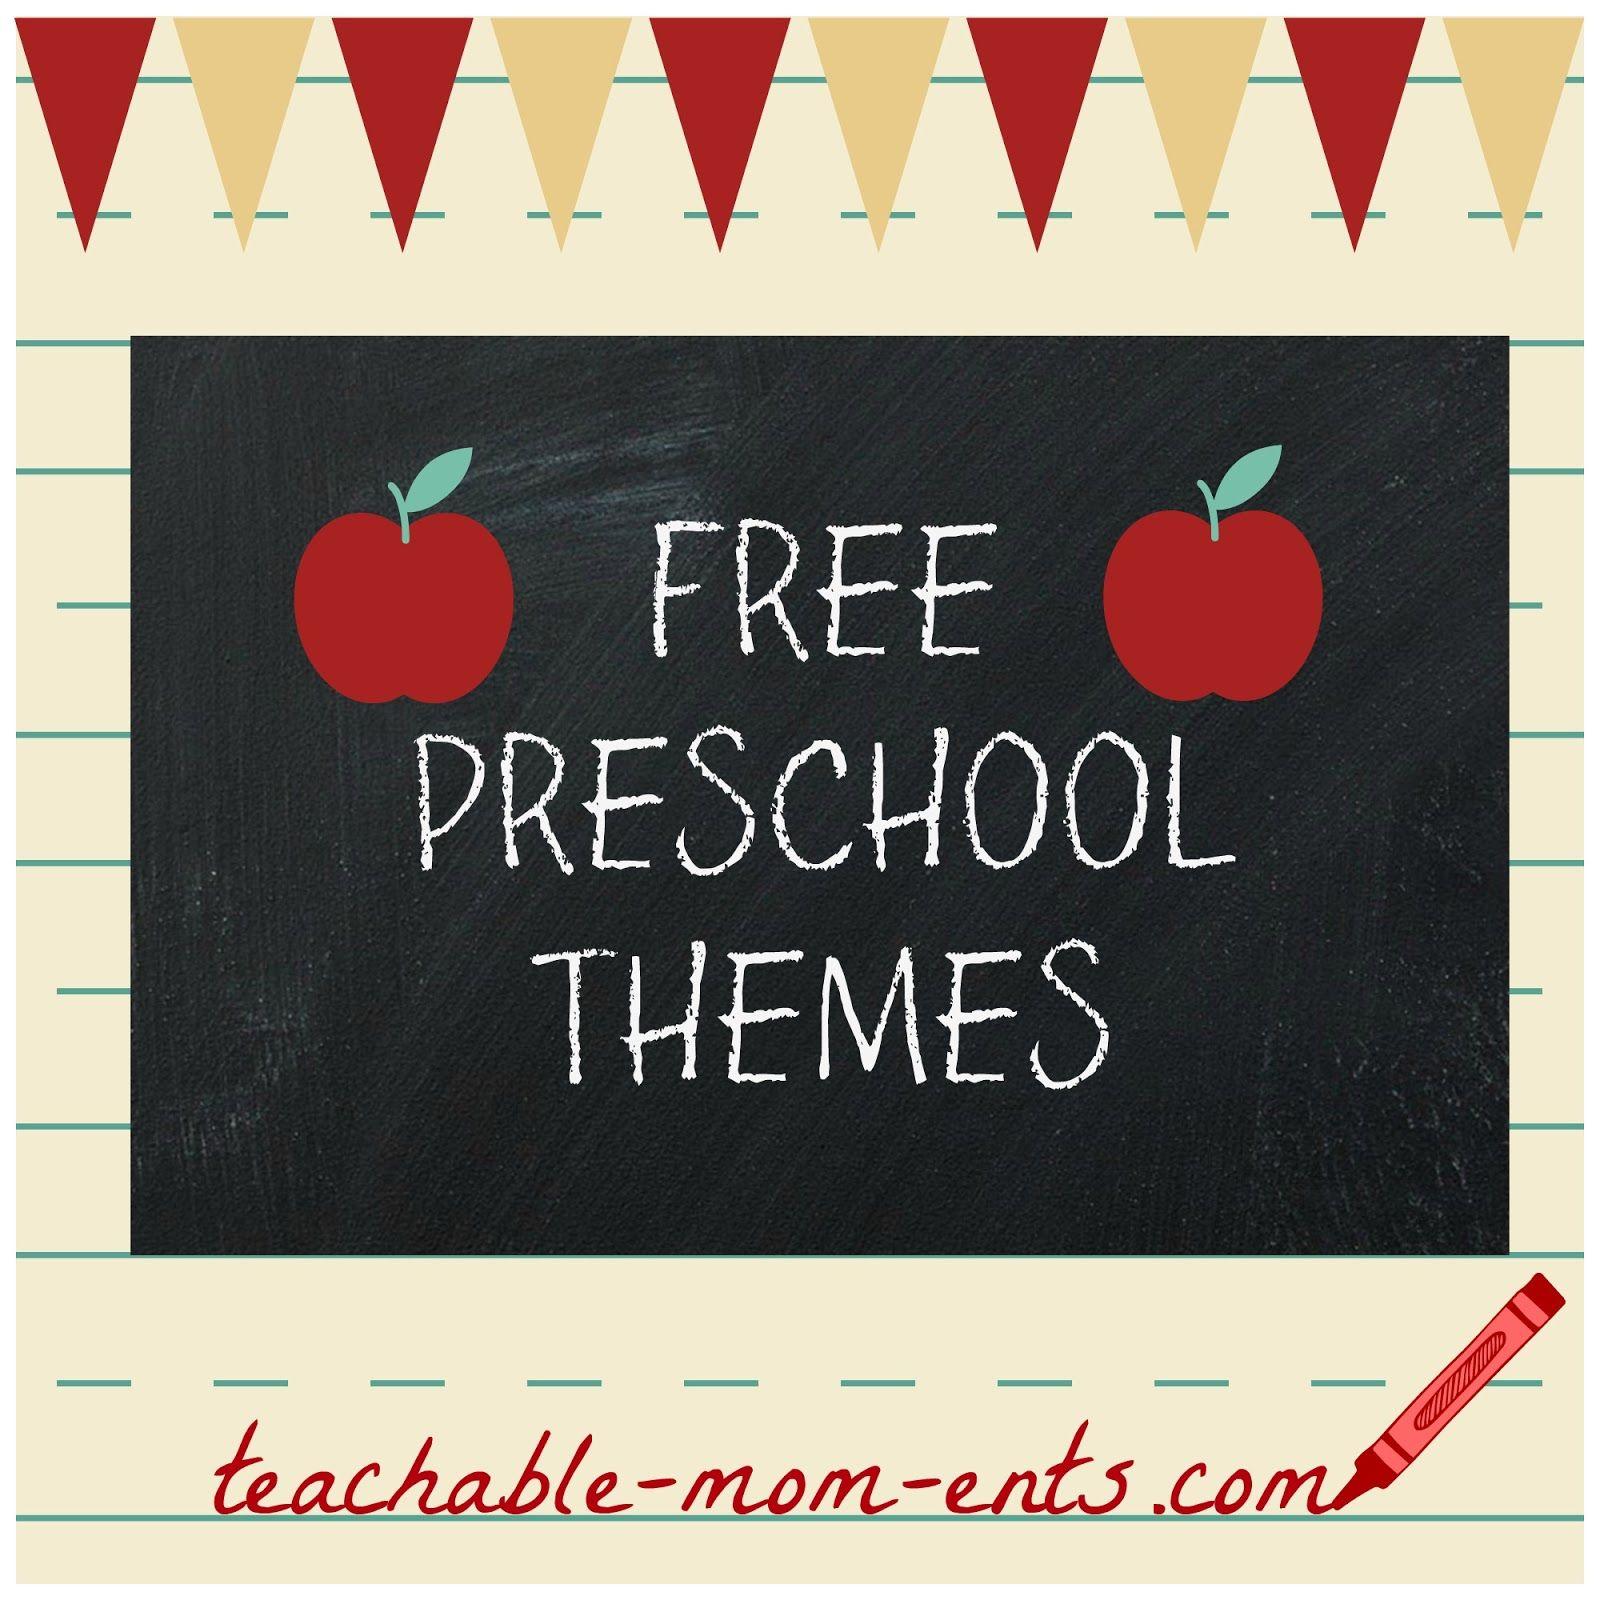 Free Preschool Resources As a former preschool teacher turned ...